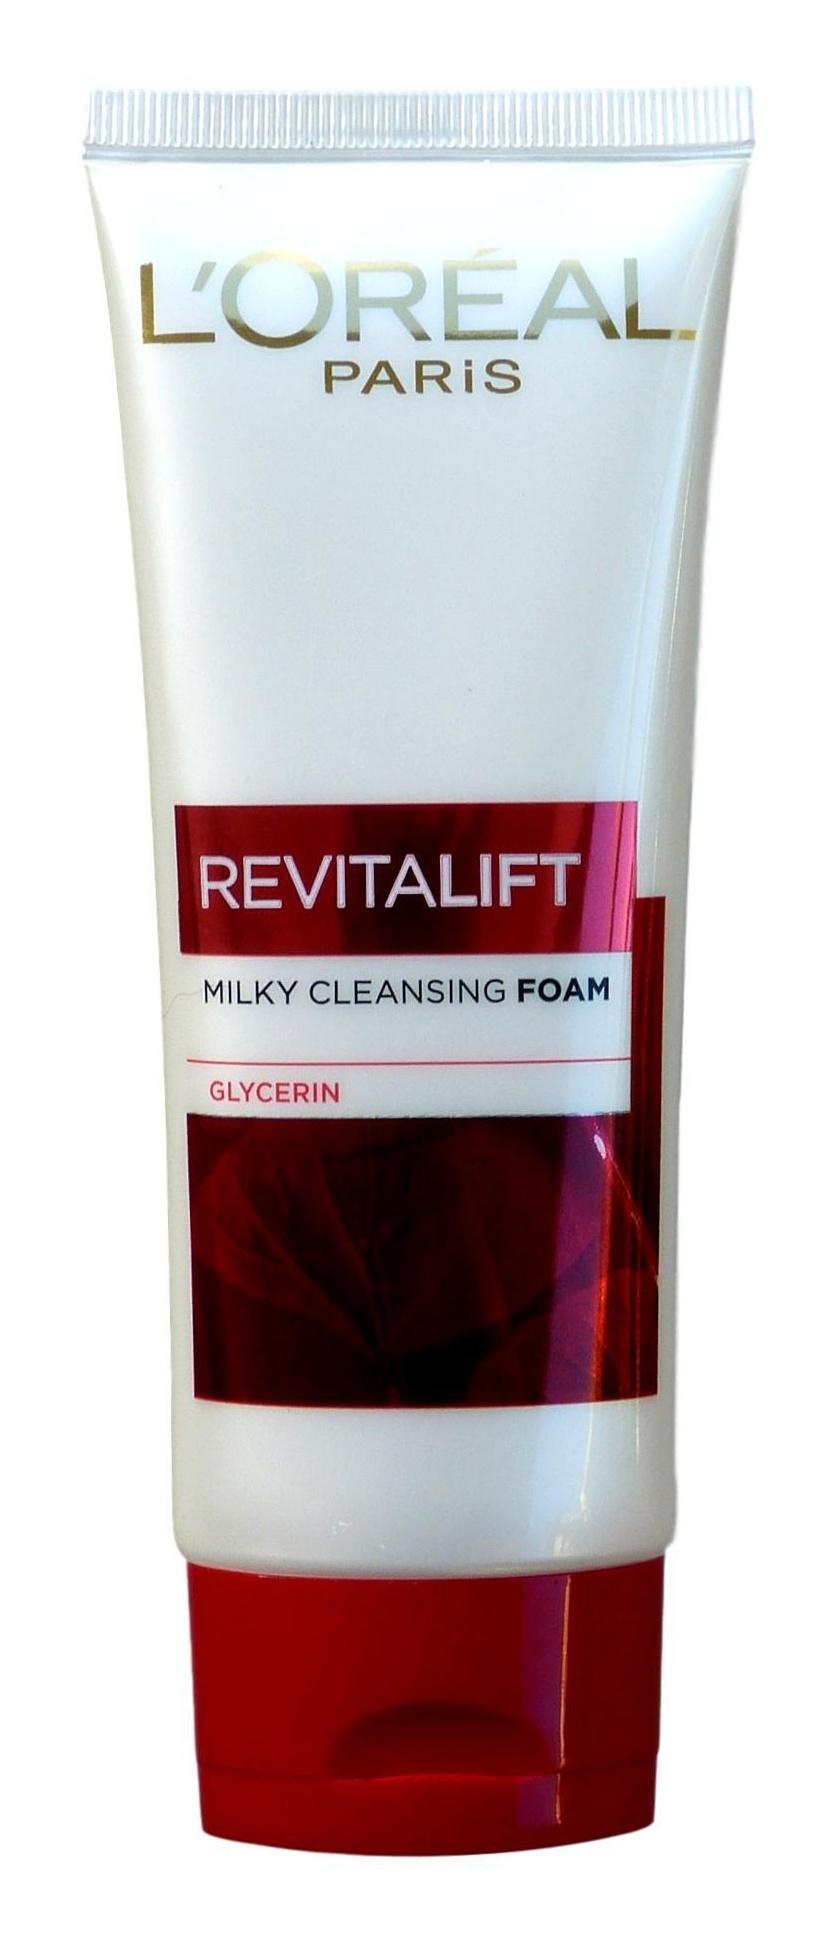 L'Oreal Paris Revitalift Milk Cleansing Foam